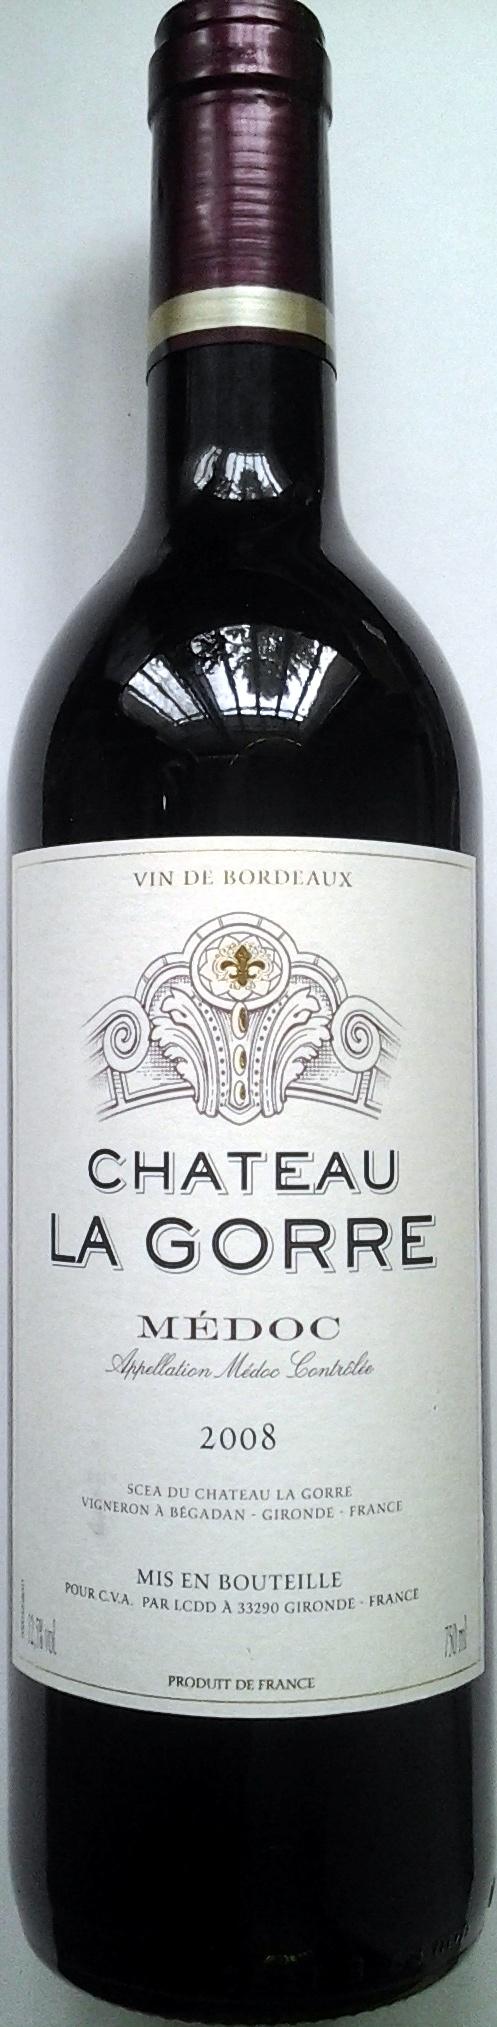 Chateau La Gorre 2008 - Produit